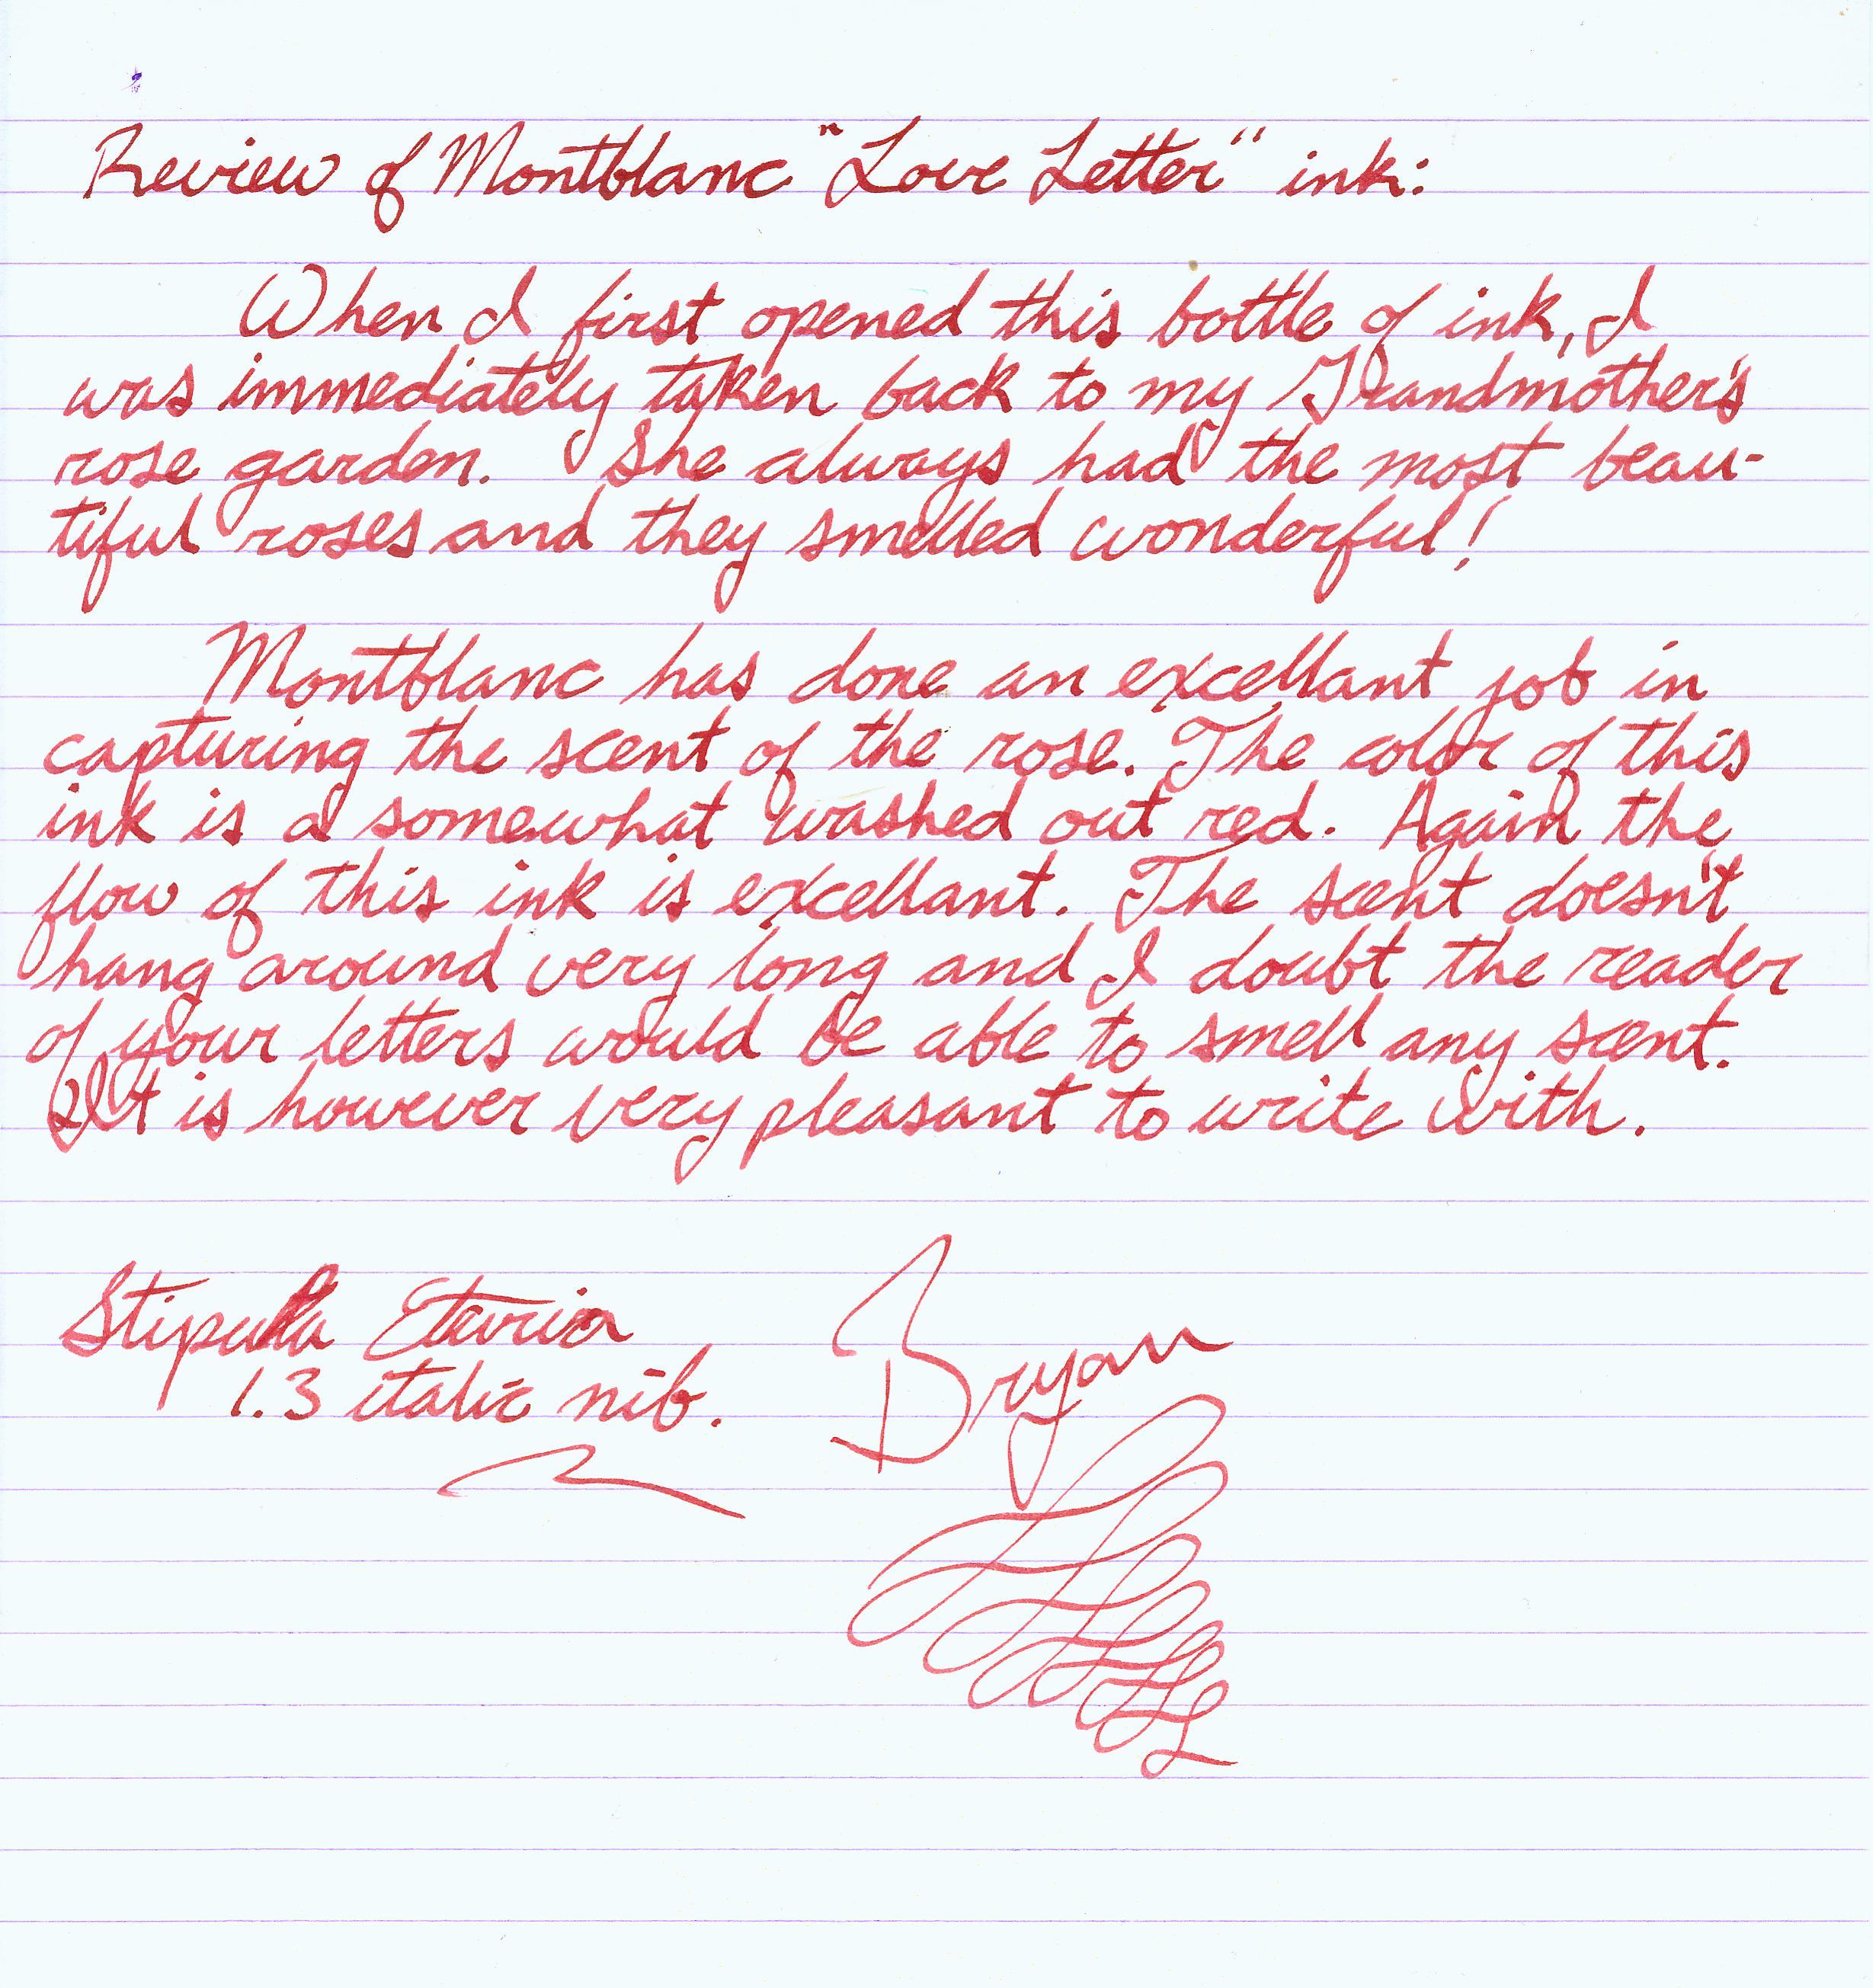 Minchew blog love letter sample – Samples of Love Letters to Boyfriend